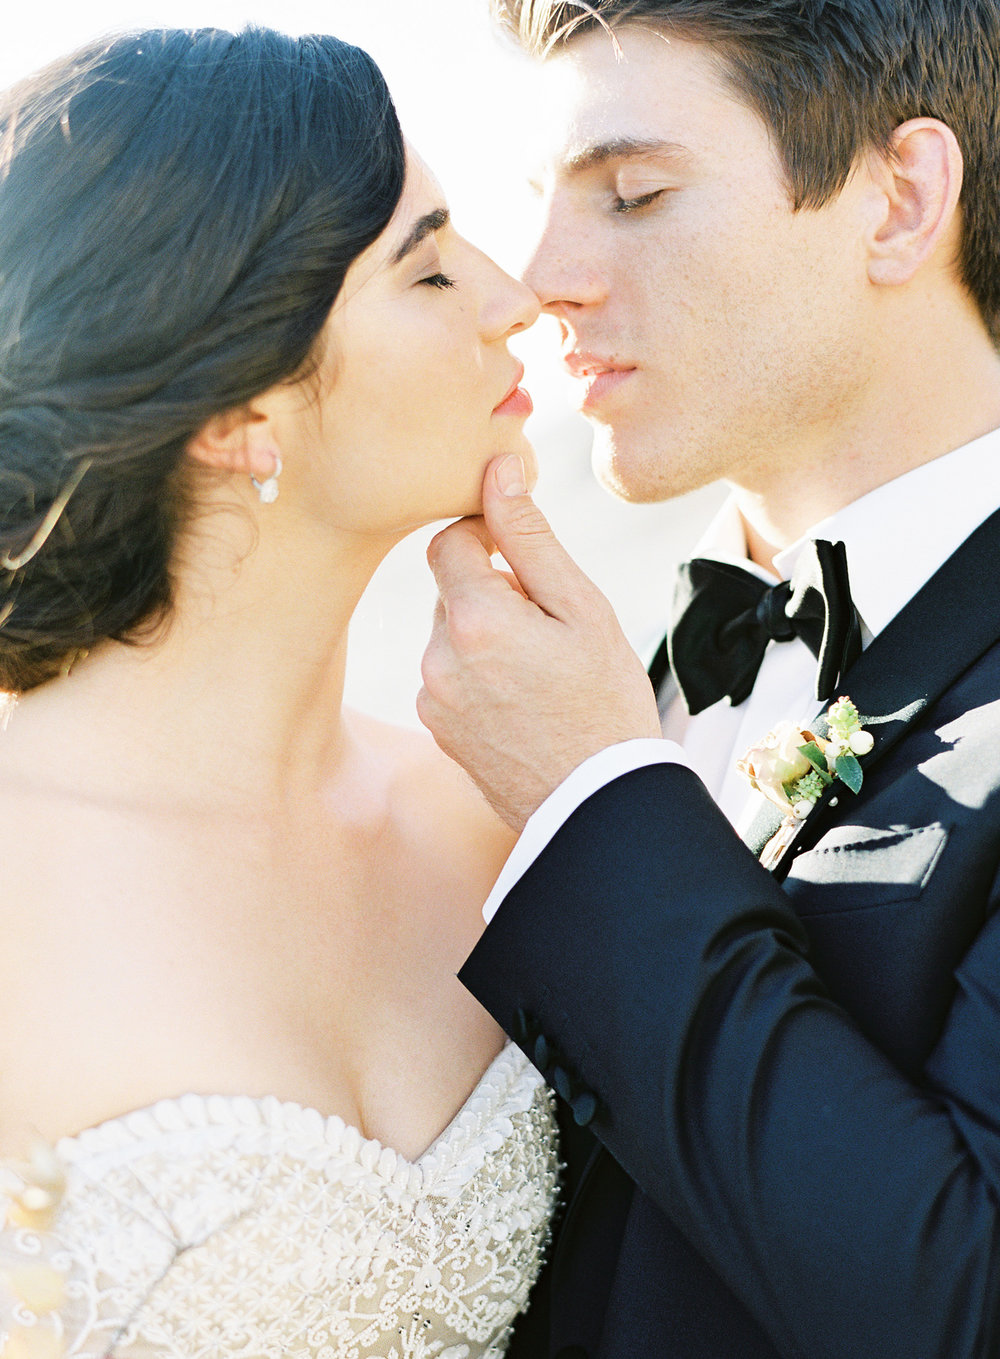 European wedding inspiration | Hautefetes | Plenty of Petals | Fine art film photographer | fine art wedding | romantic bride and groom wedding | whiskers and willow photography